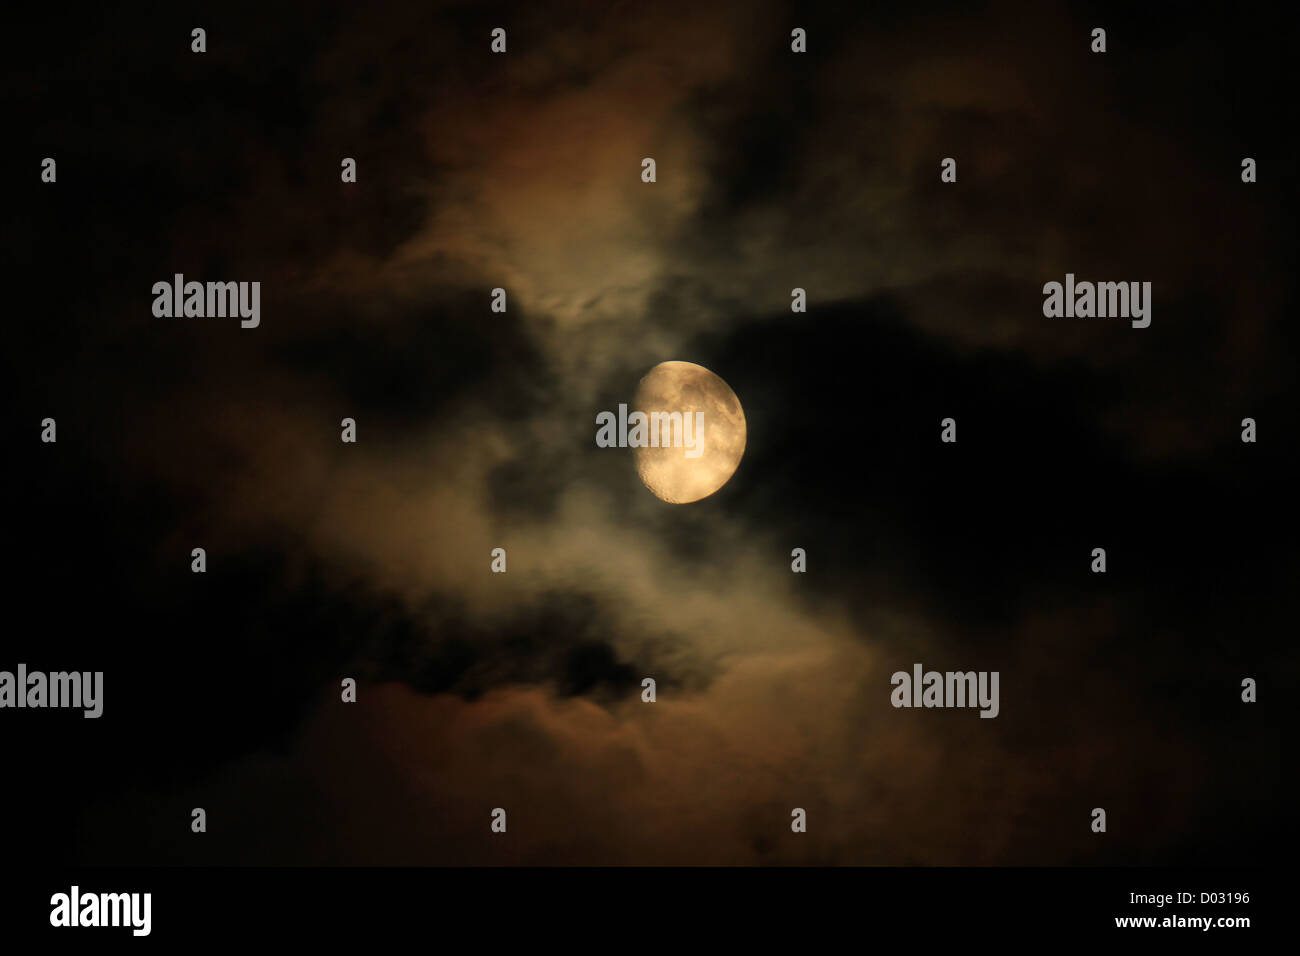 The moon hide behind sky. - Stock Image